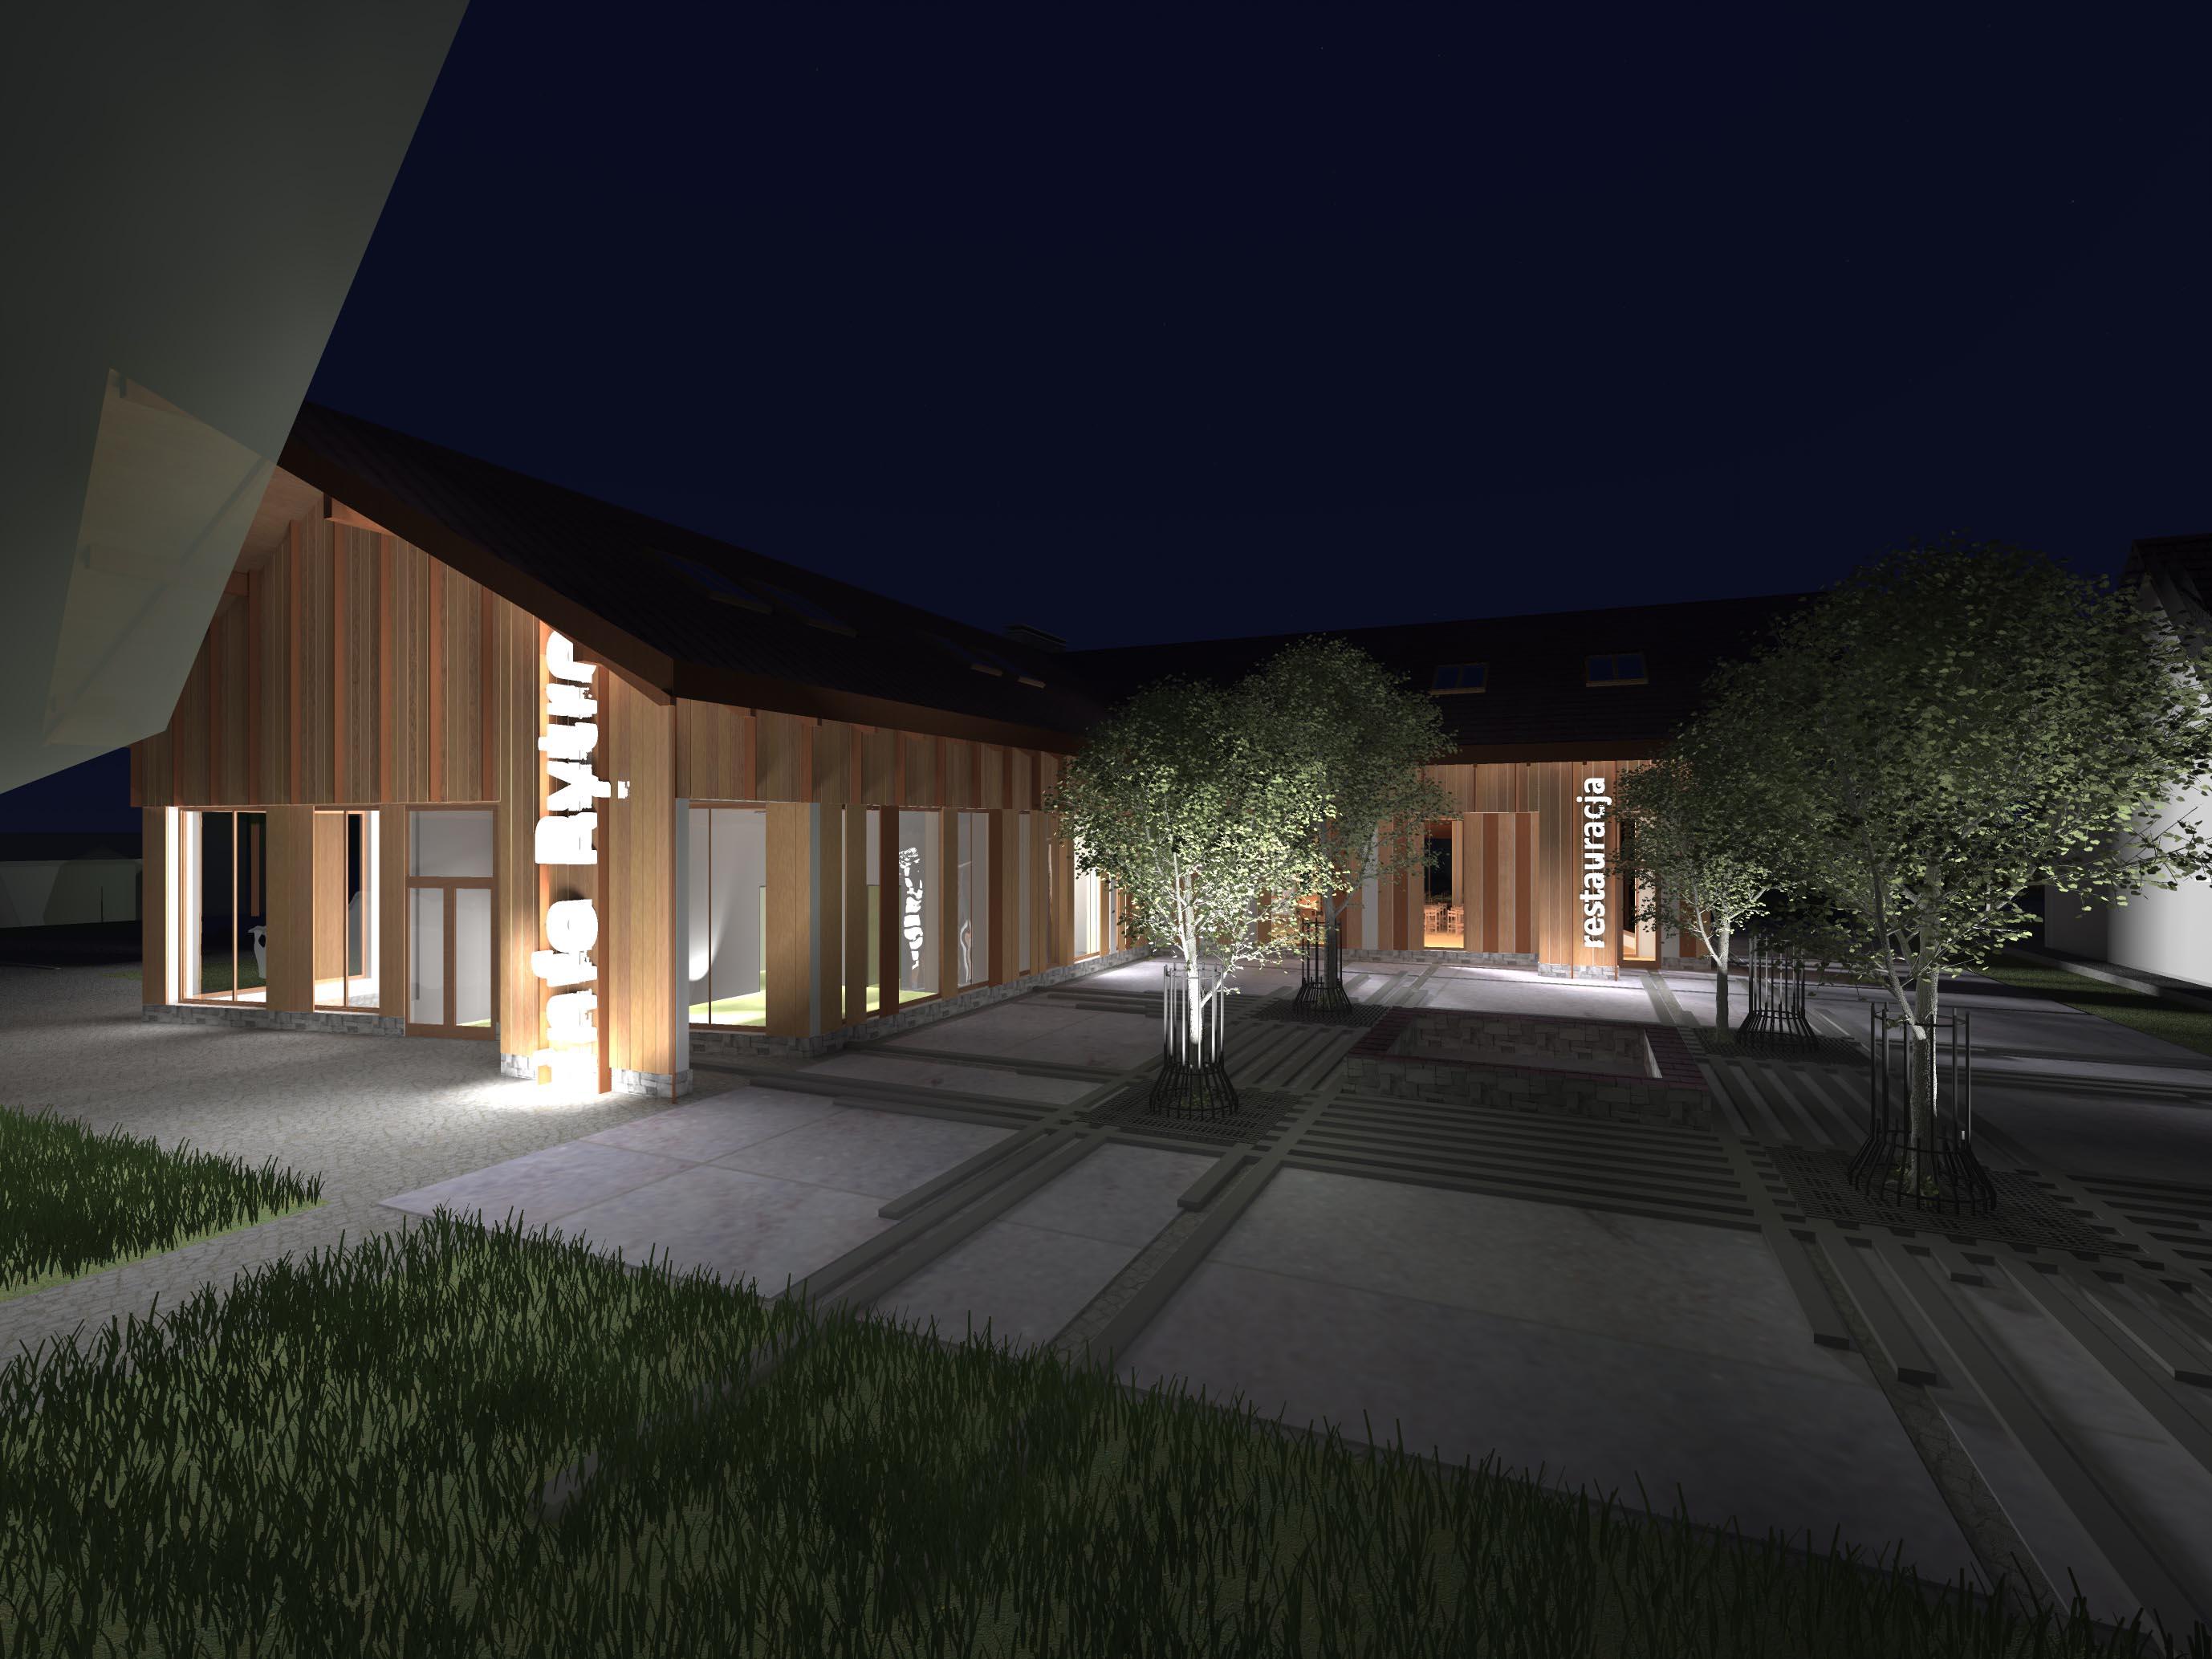 Projekt centrum gminy Rytro